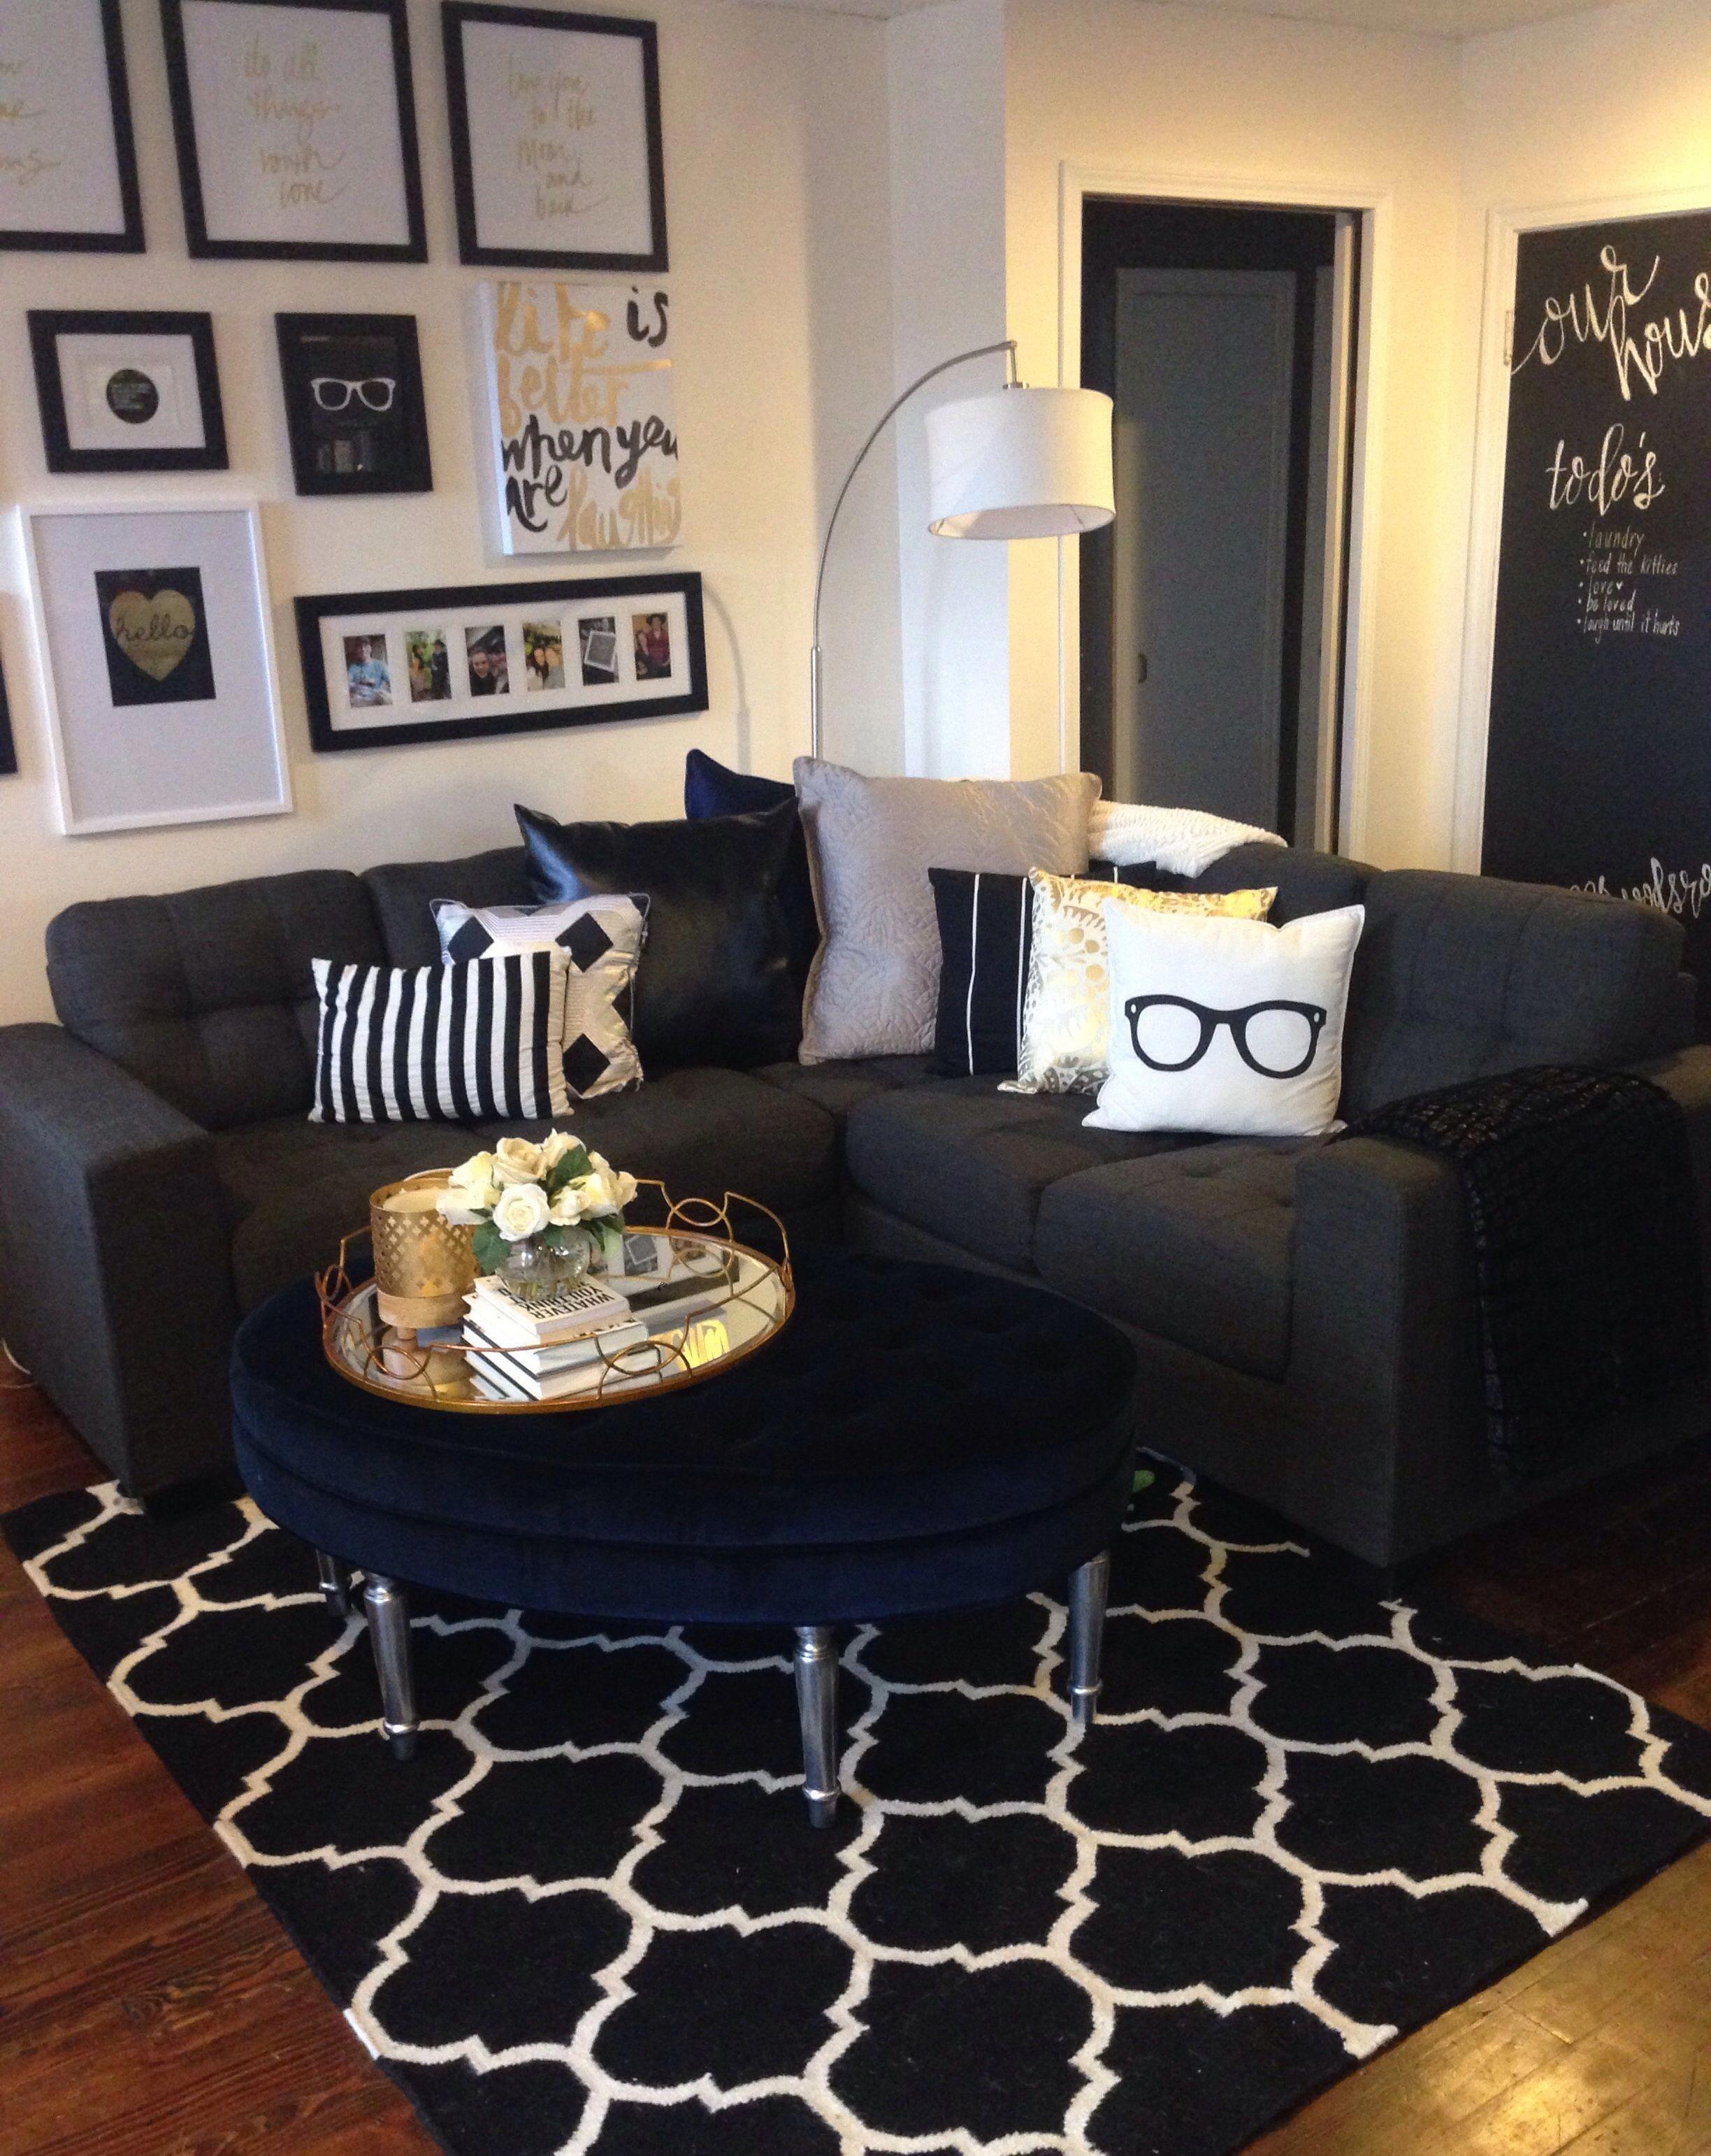 Diyapartment Apartment Decorating Rental Gold Living Room